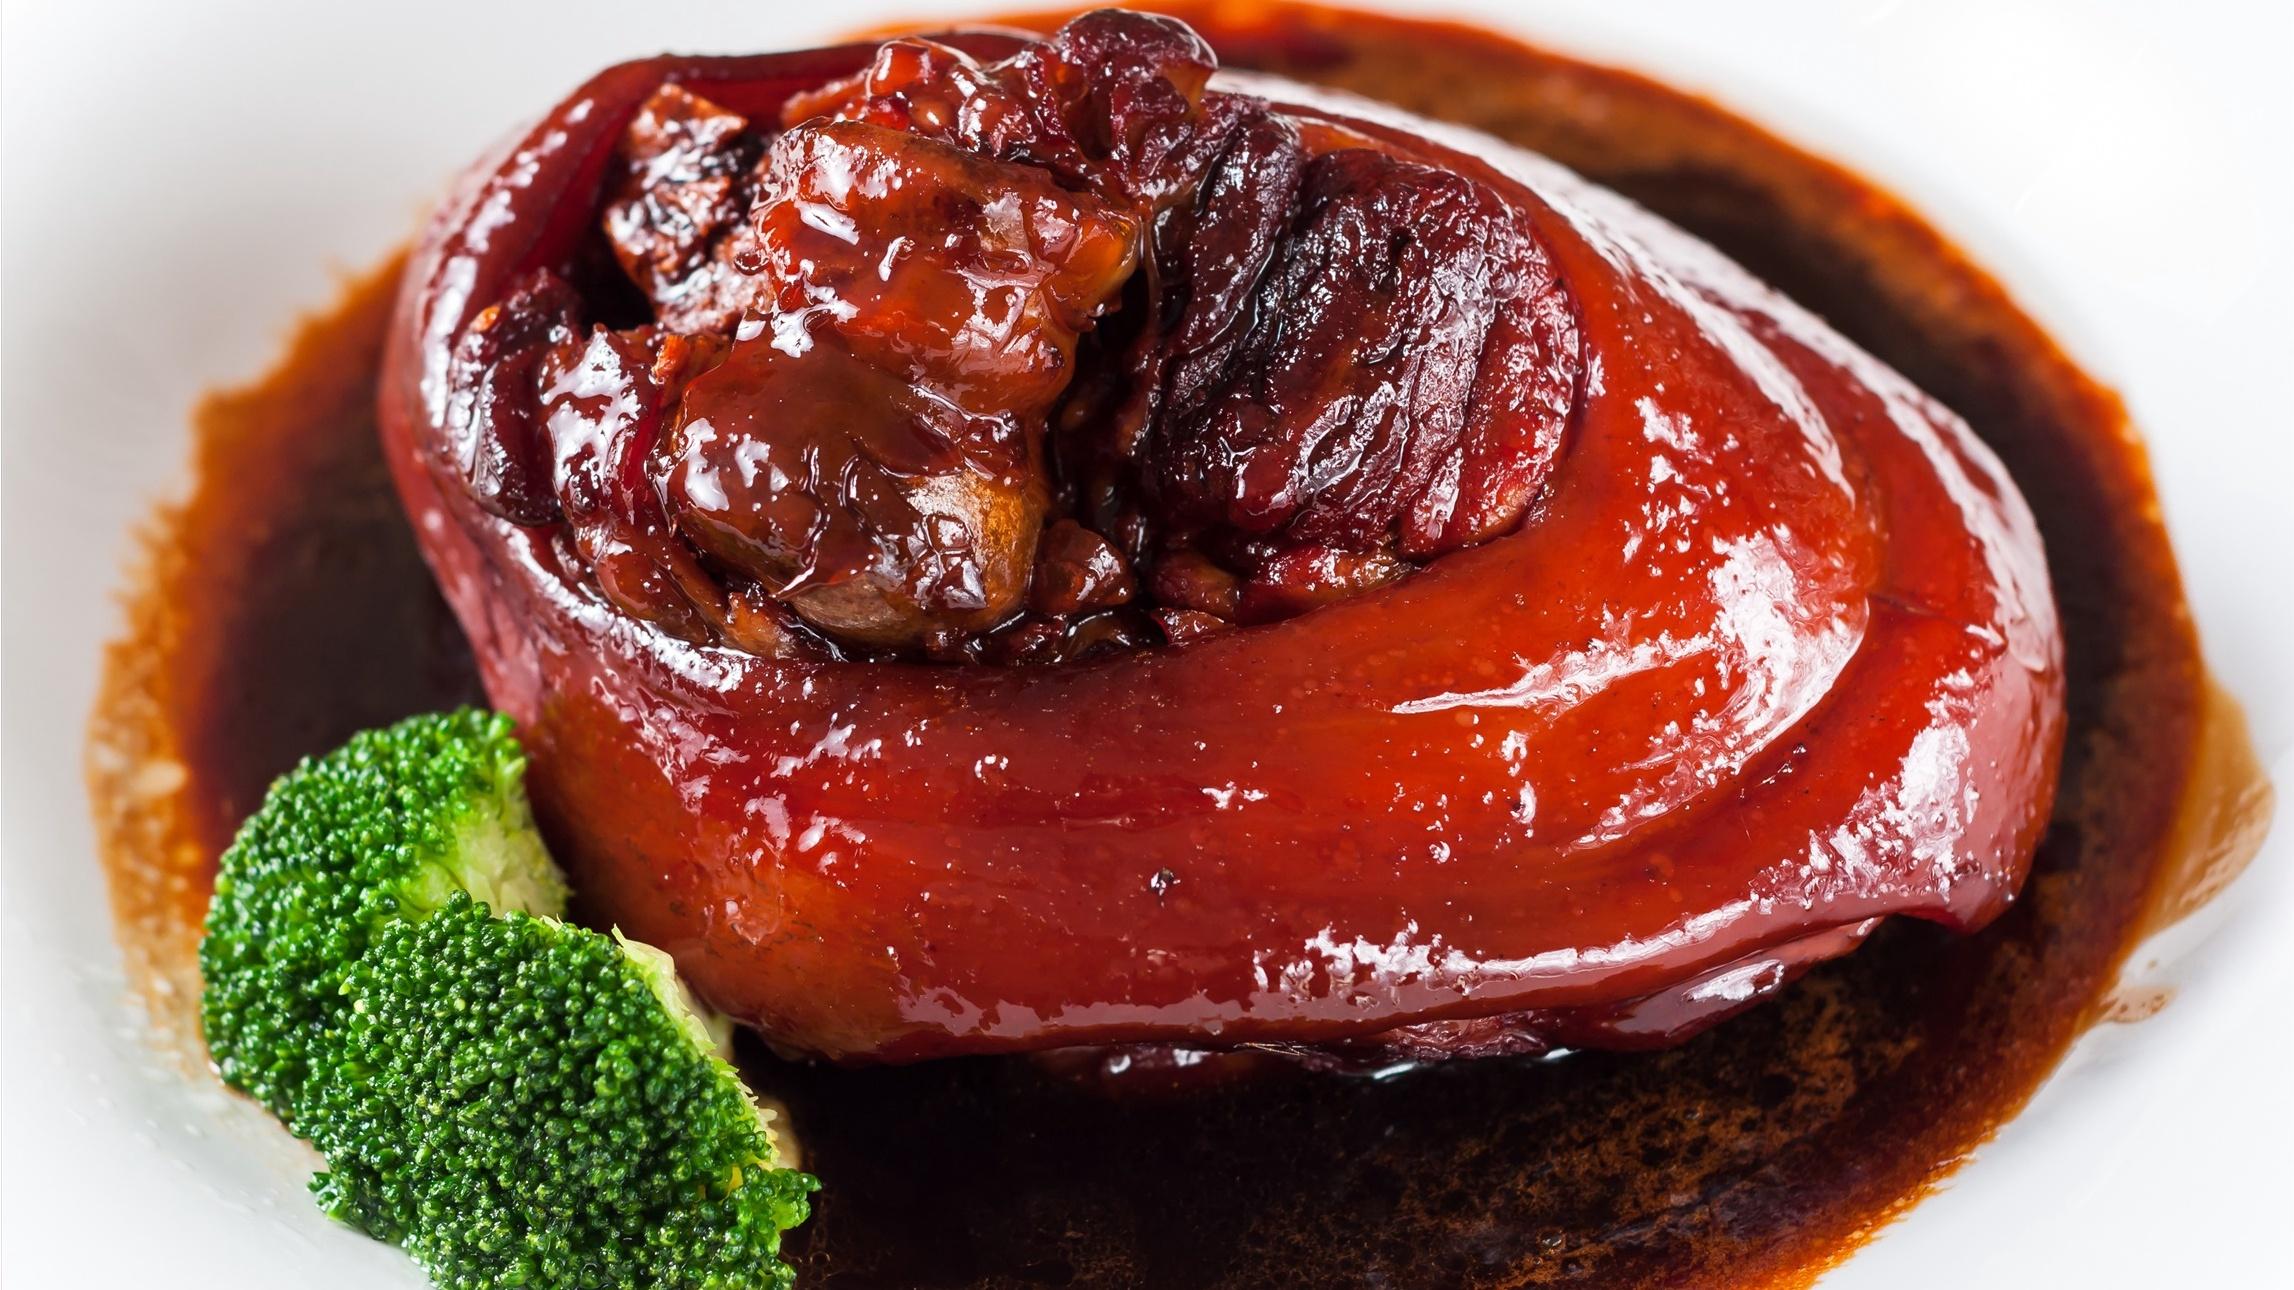 Menu for Spring Festival Eve: Red braised pork belly